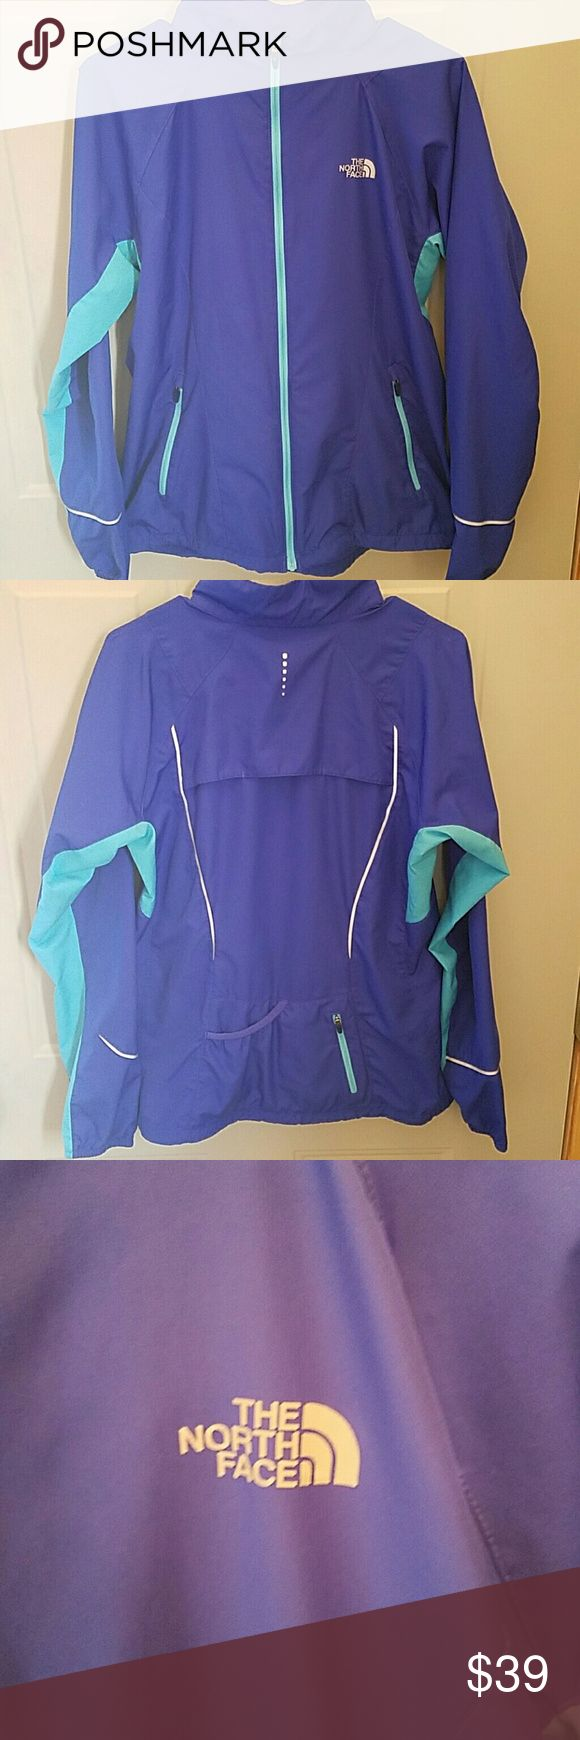 North Face women's running jacket Lightweight, super comfy running jacket. NOT. Never worn The North Face Jackets & Coats